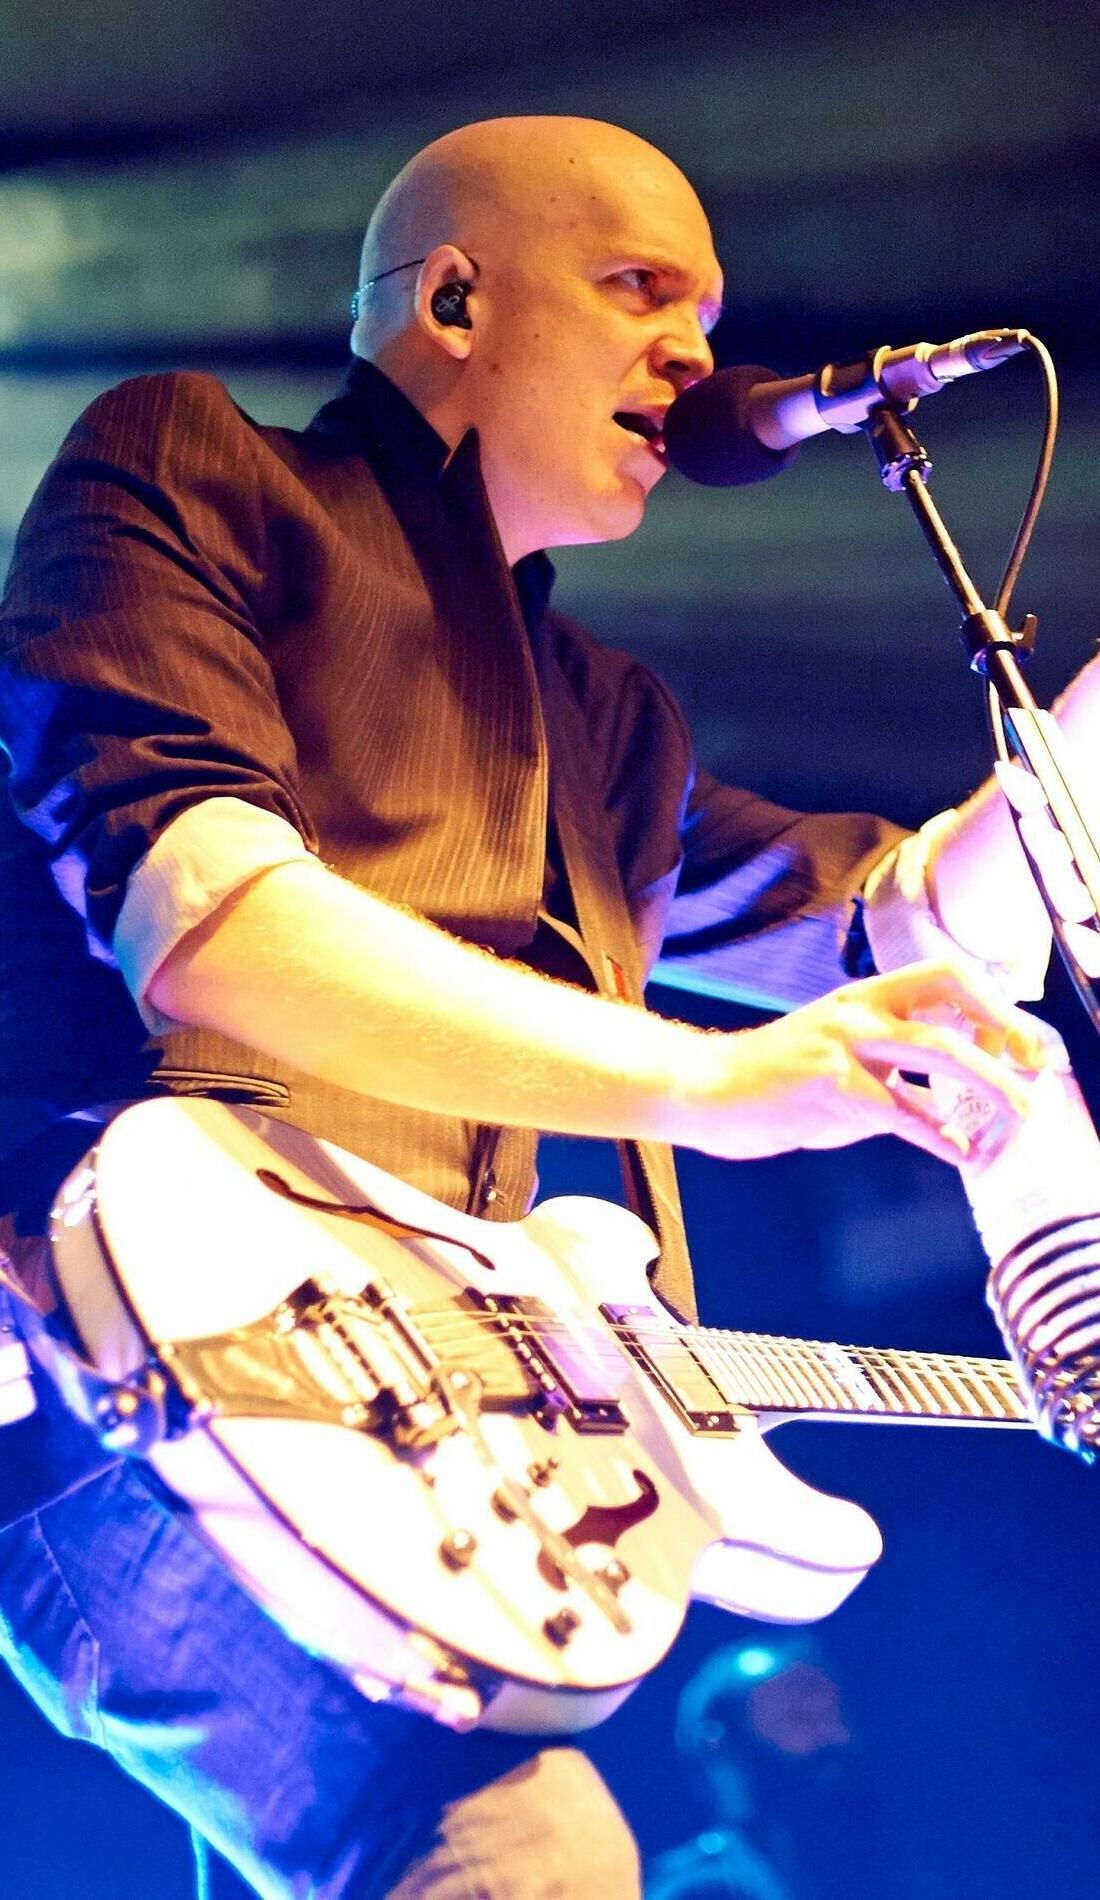 A Devin Townsend live event